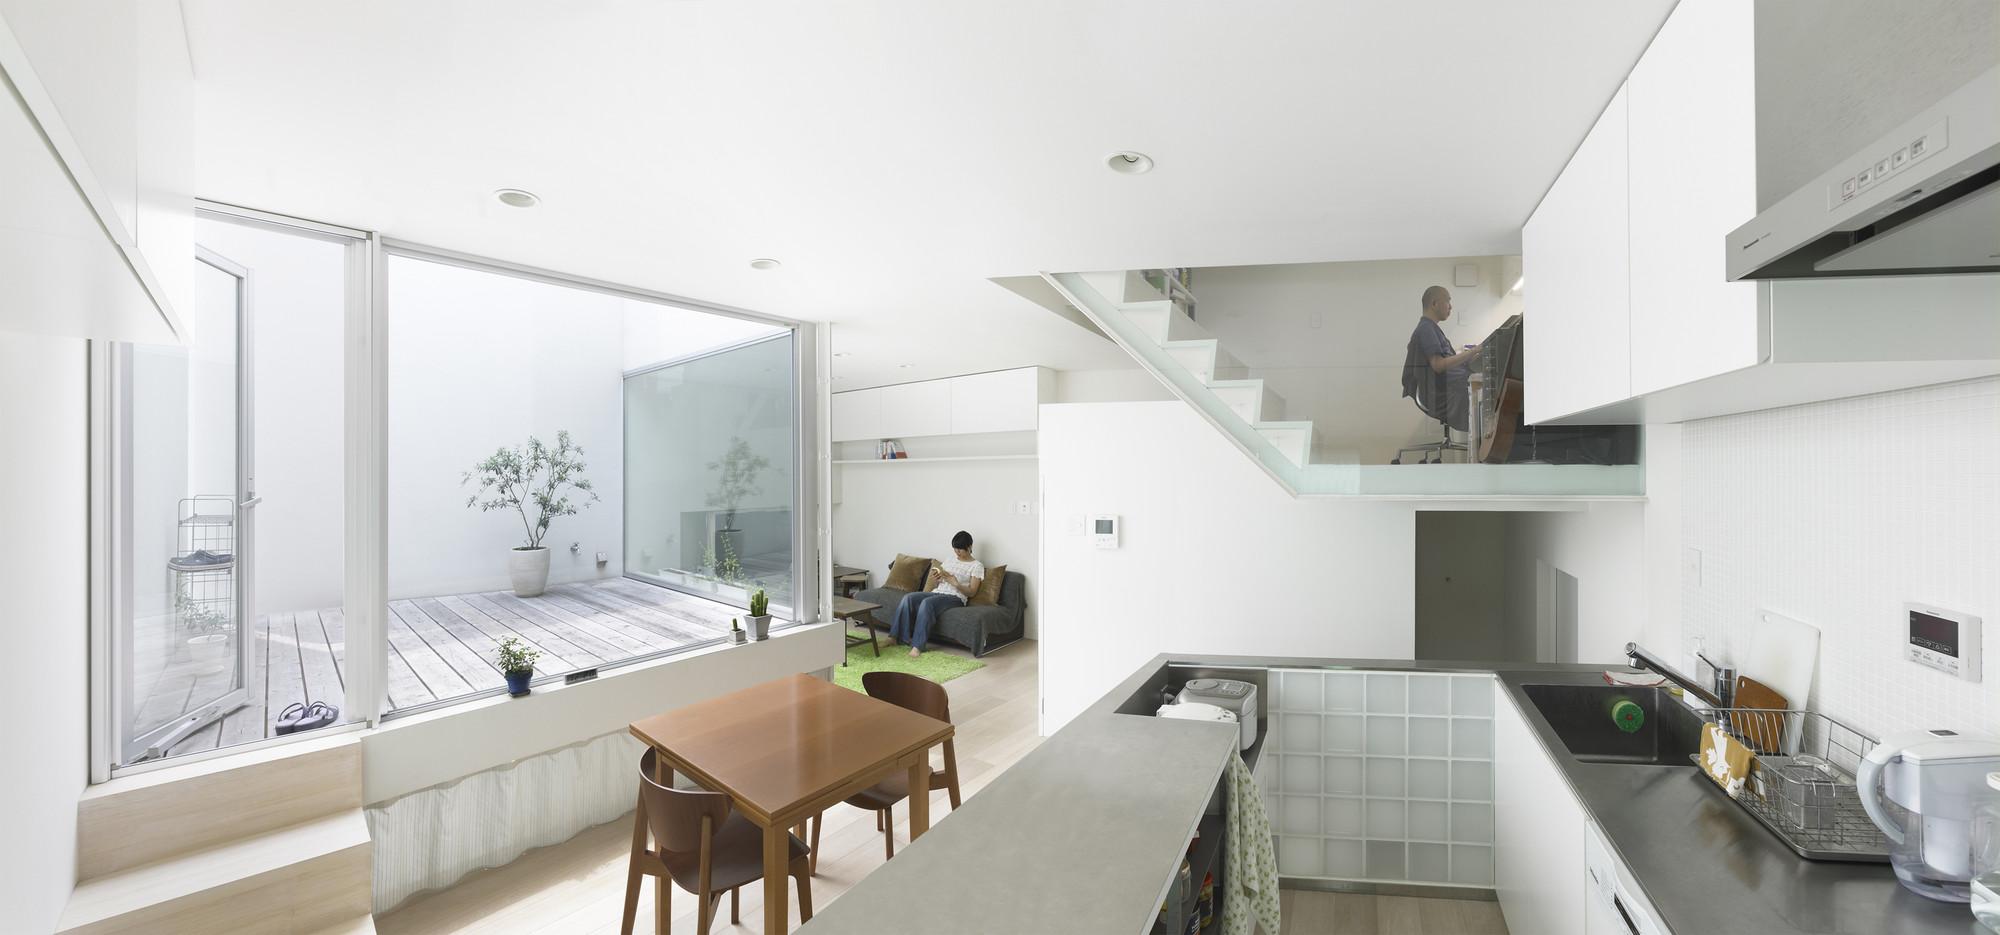 House M / Teppei Fujiwara Architects Labo, © Sadao Hotta